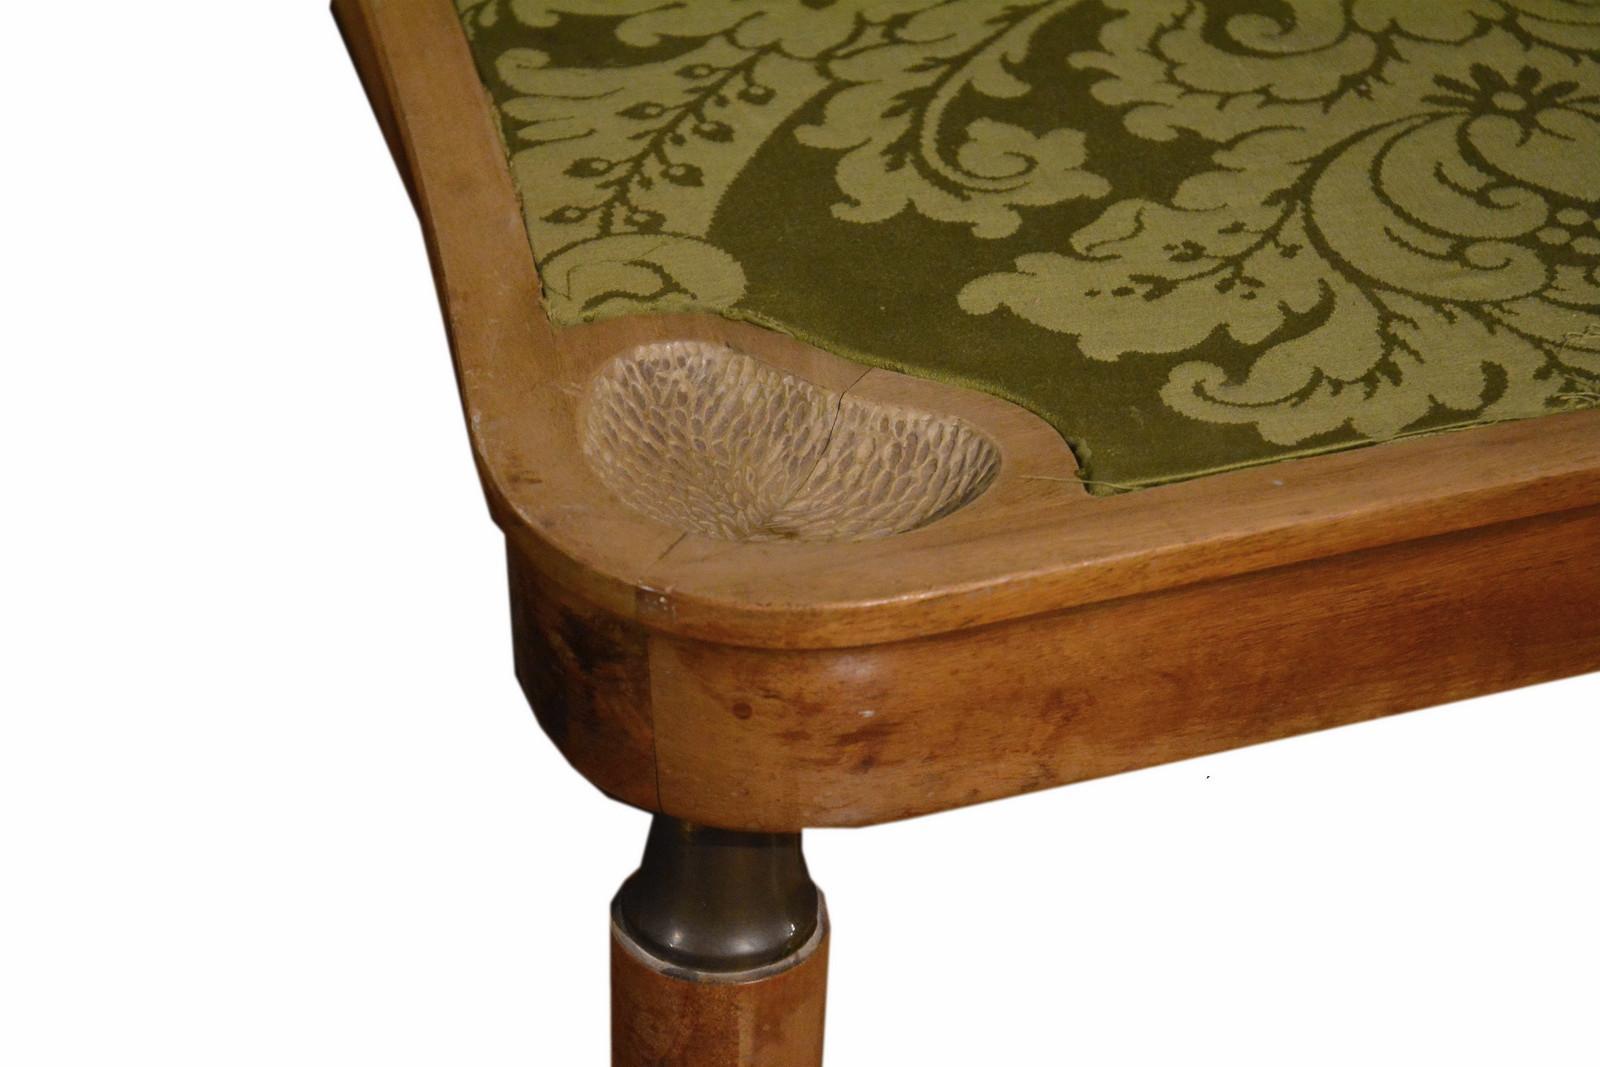 tavolo-inglese-anni-20-scrittorio-e-gioco-poker-3,2959.jpg?WebbinsCacheCounter=1